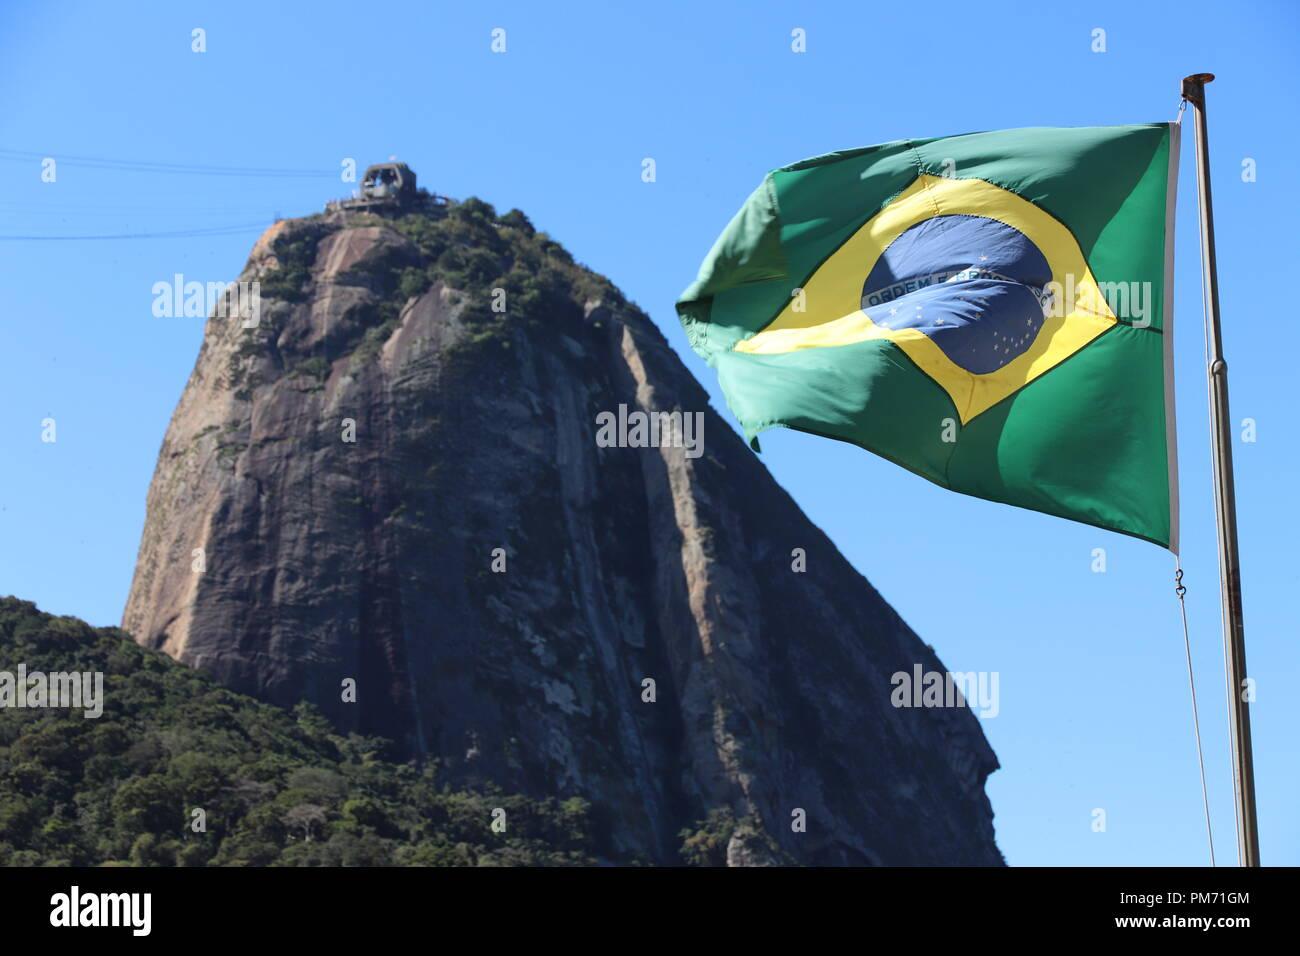 Pao de Acucar from Vermelha beach - Rio de Janeiro ( Brazil ) Stock Photo